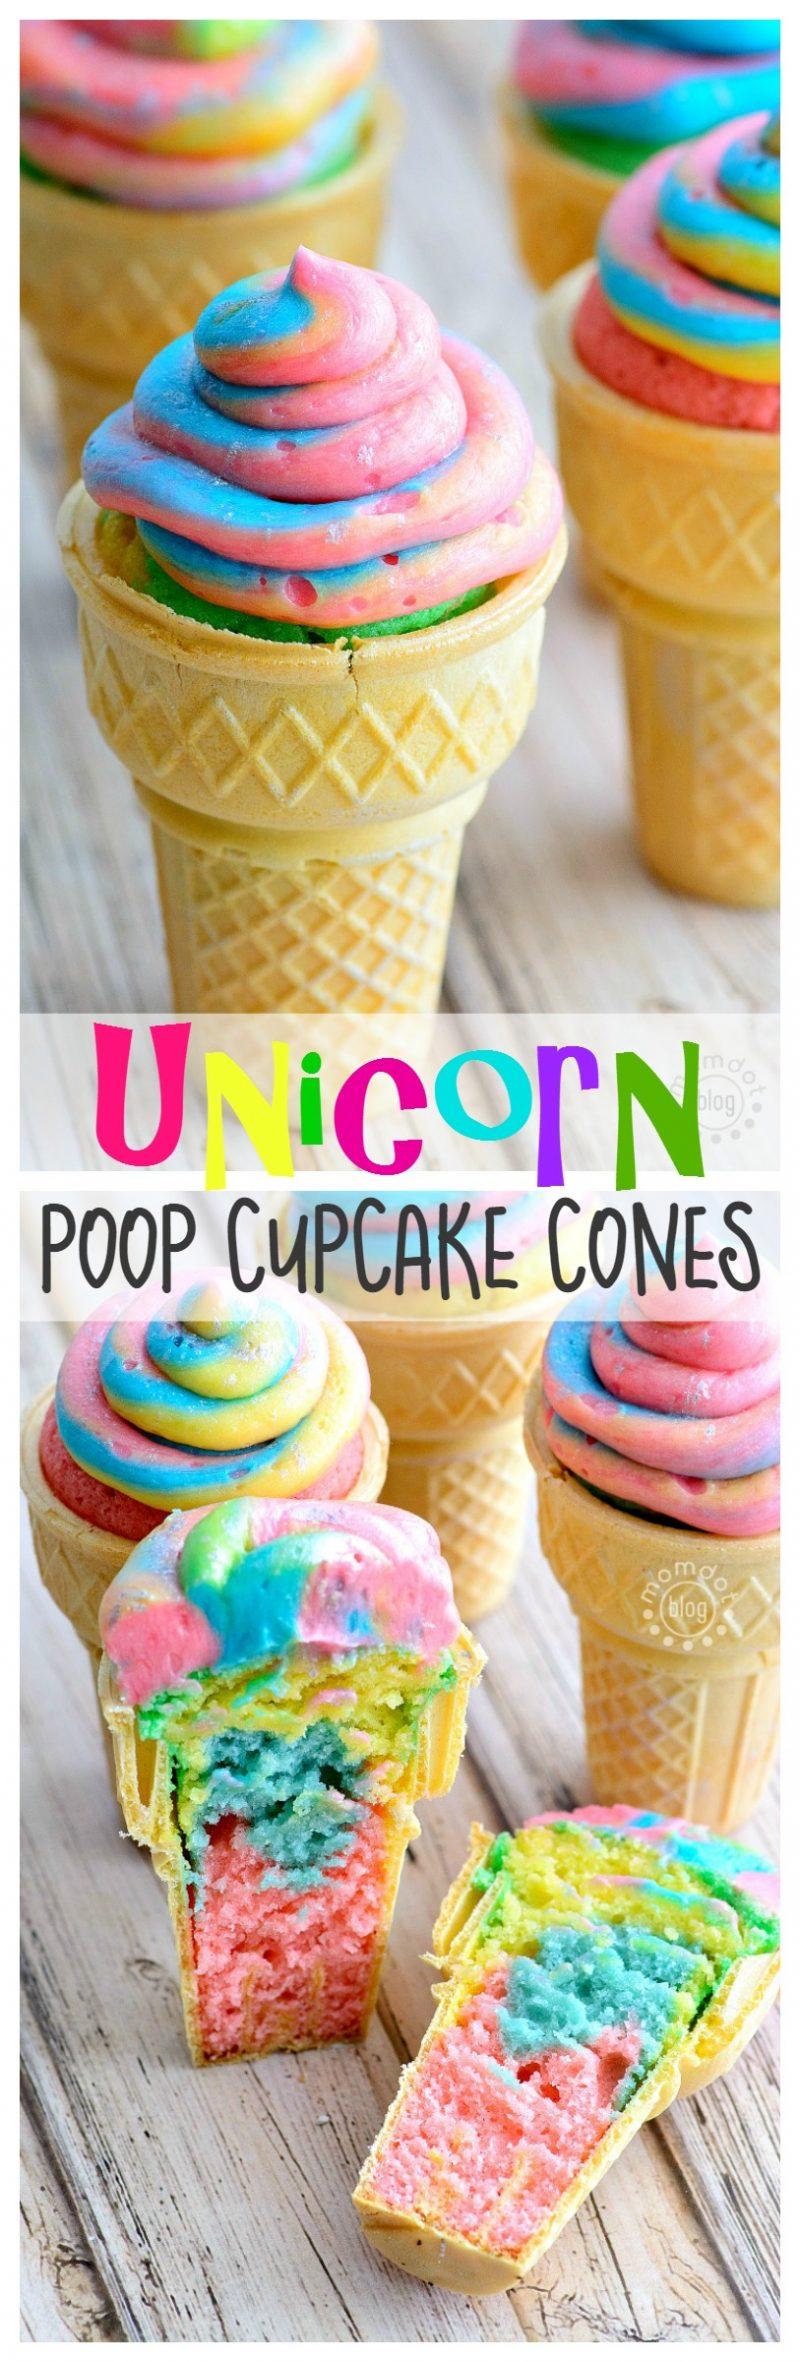 Cupcake Cones Rainbow Poop